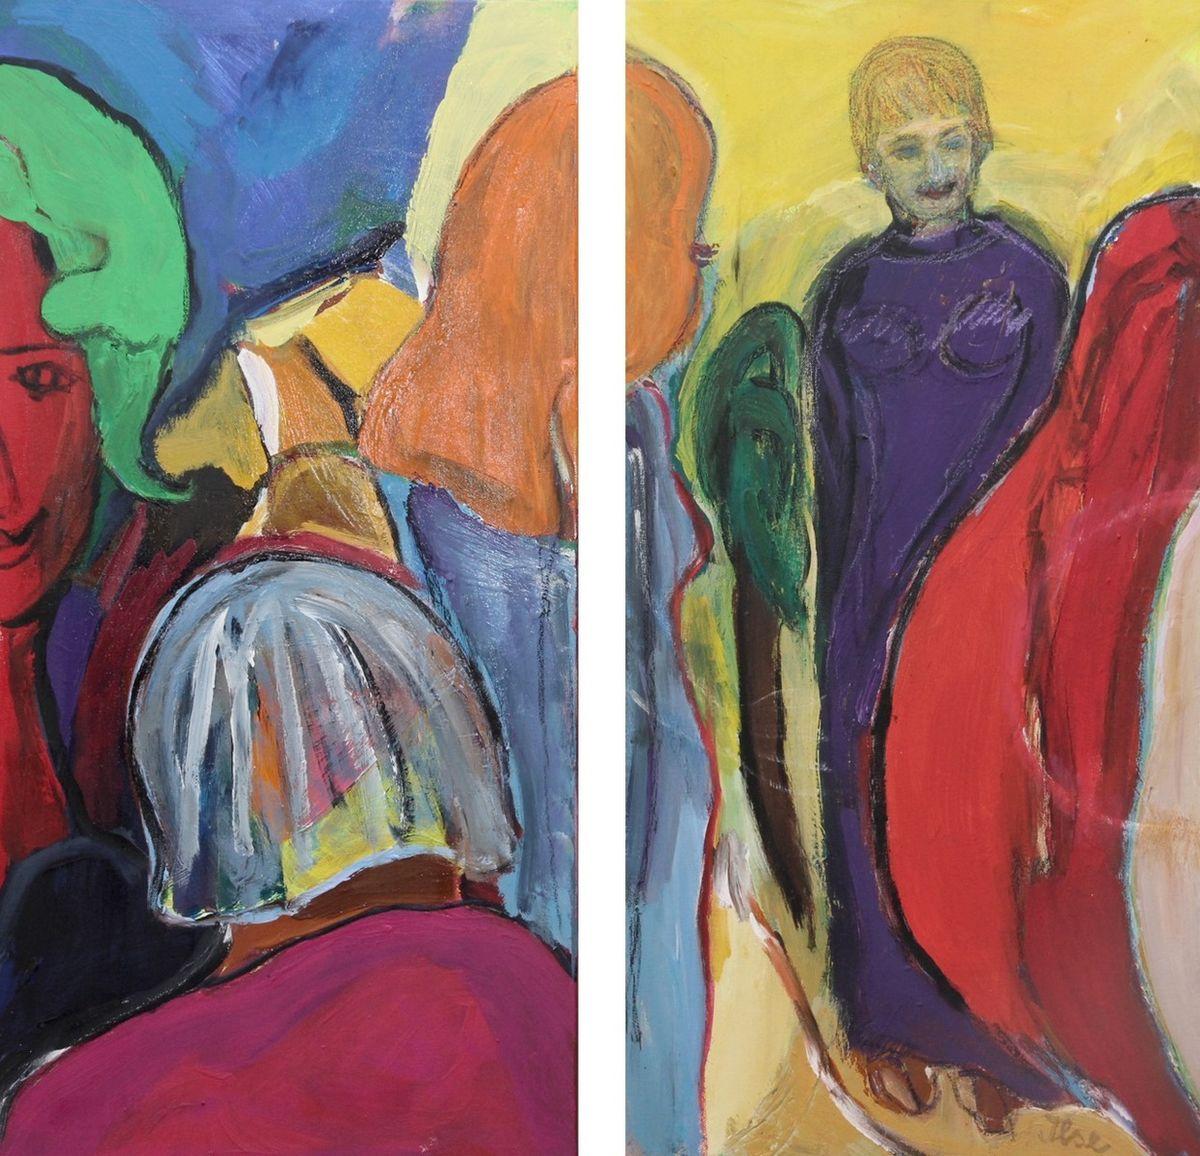 Malerei | Paintings 2012 - 2014